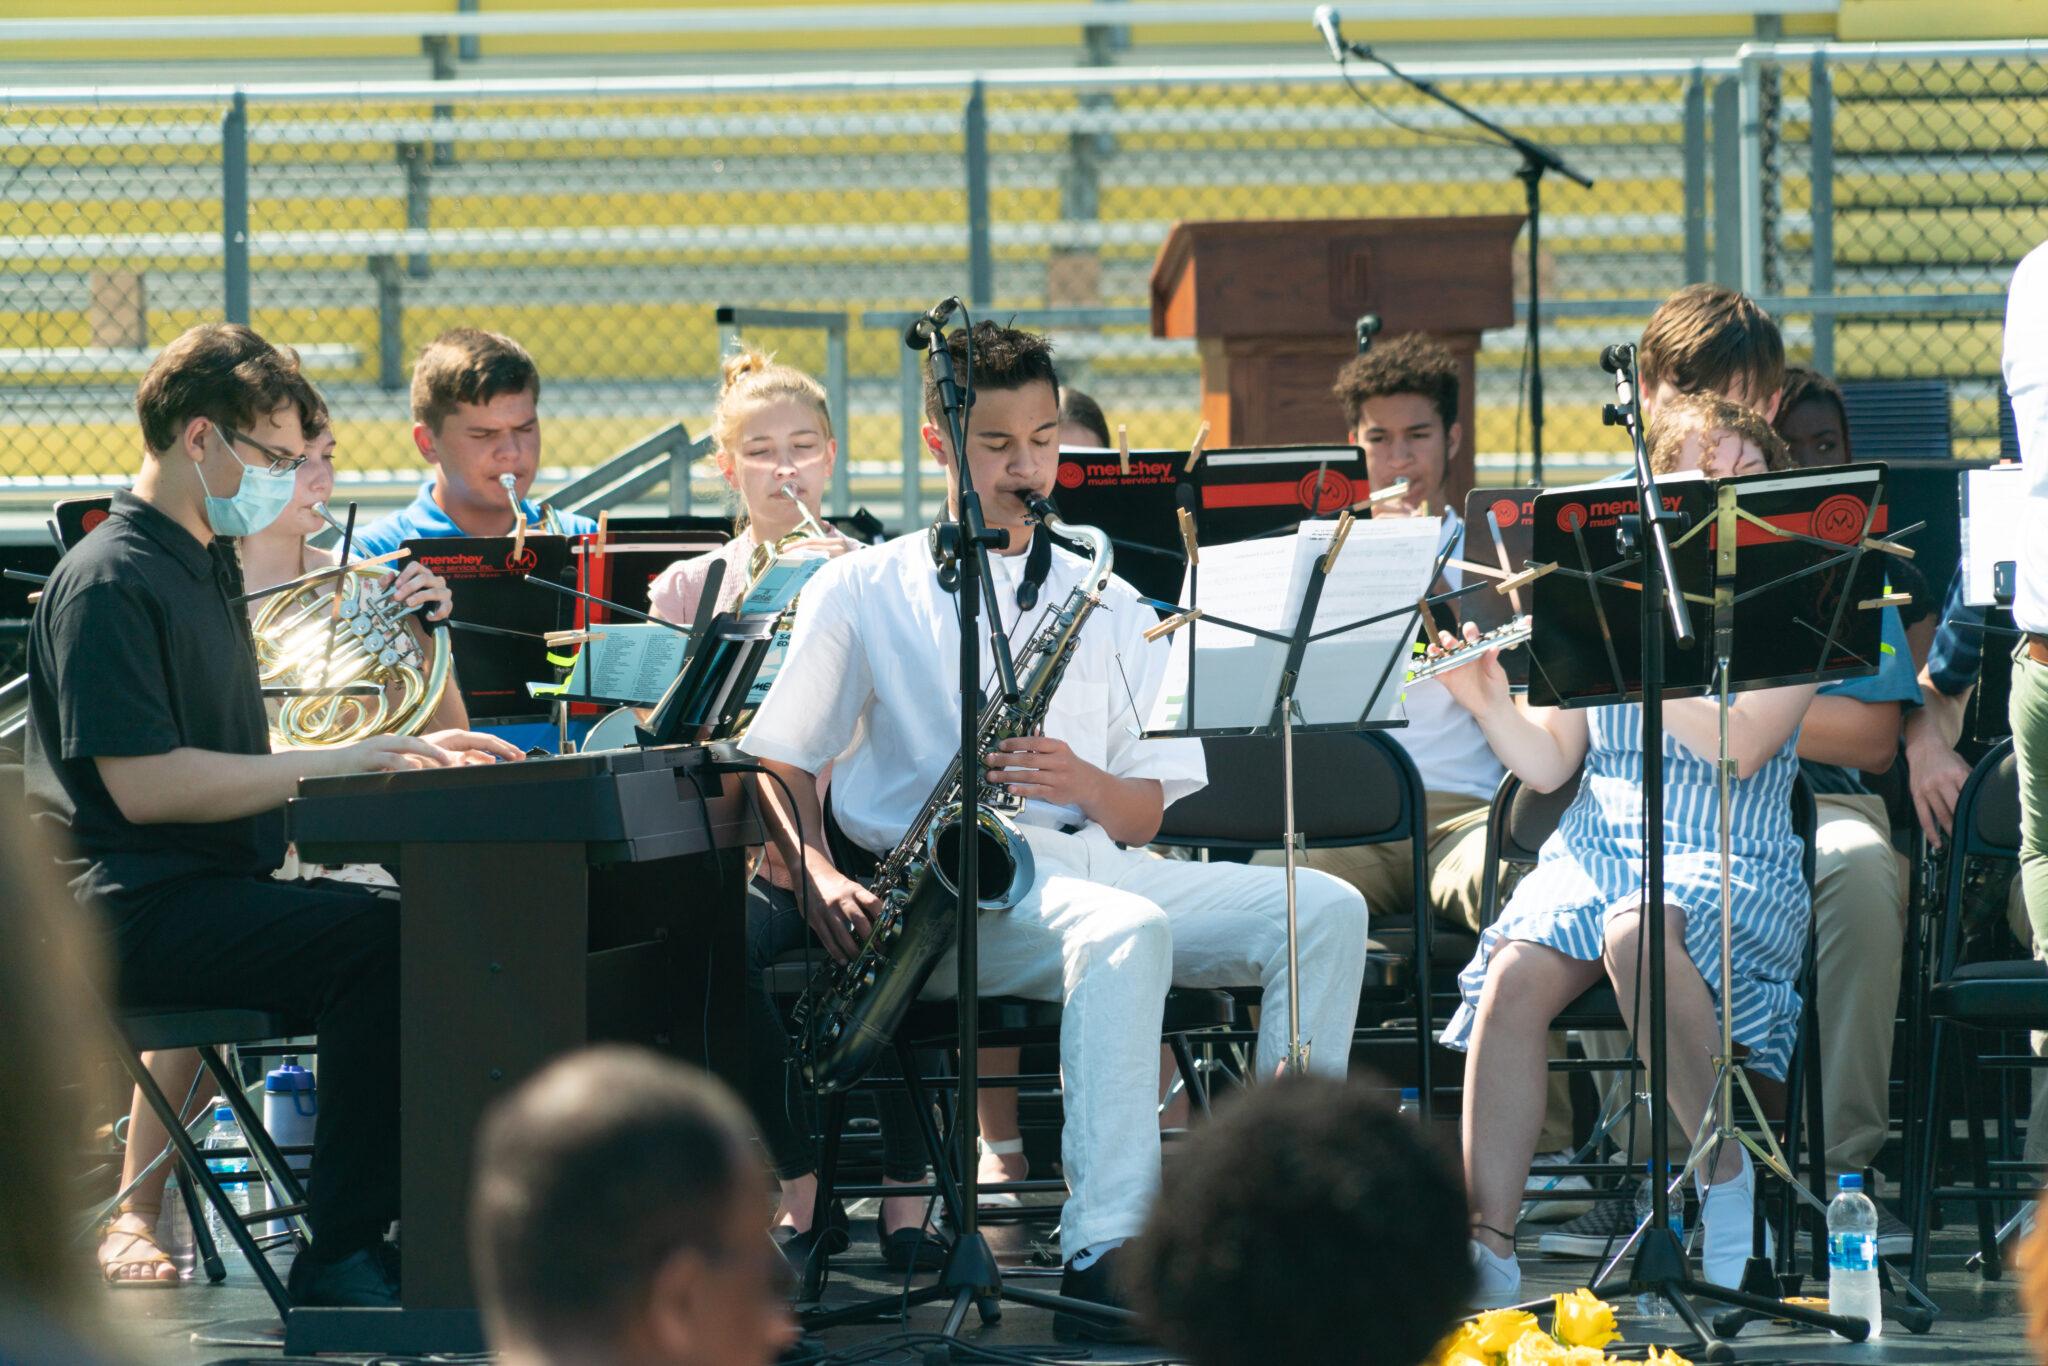 jazz band playing at graduation service